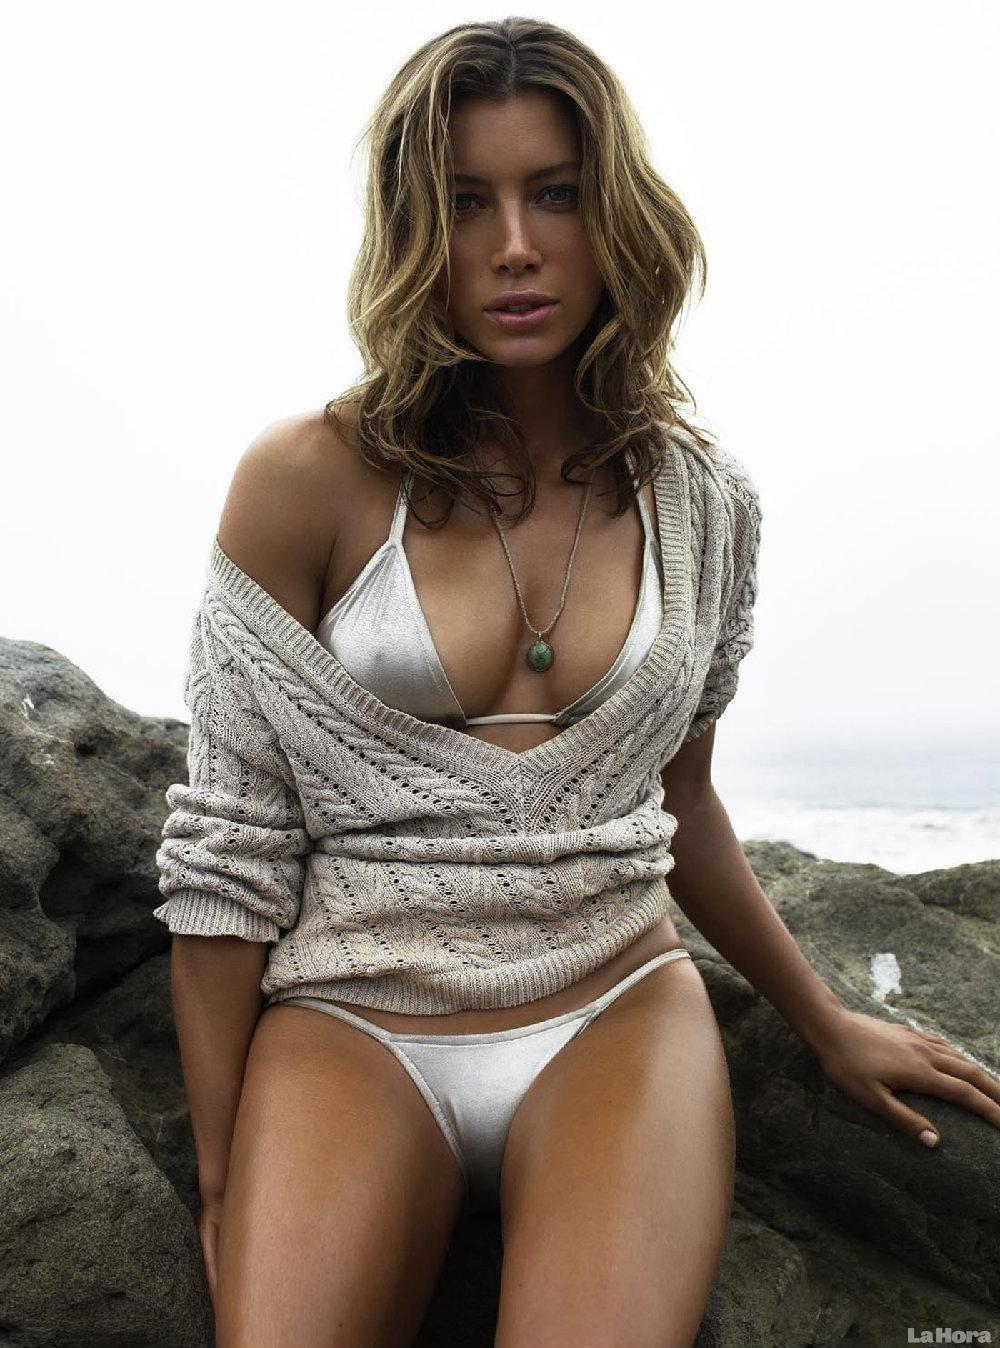 Cleavage Jessica Biel nude (49 photo), Ass, Bikini, Boobs, butt 2006